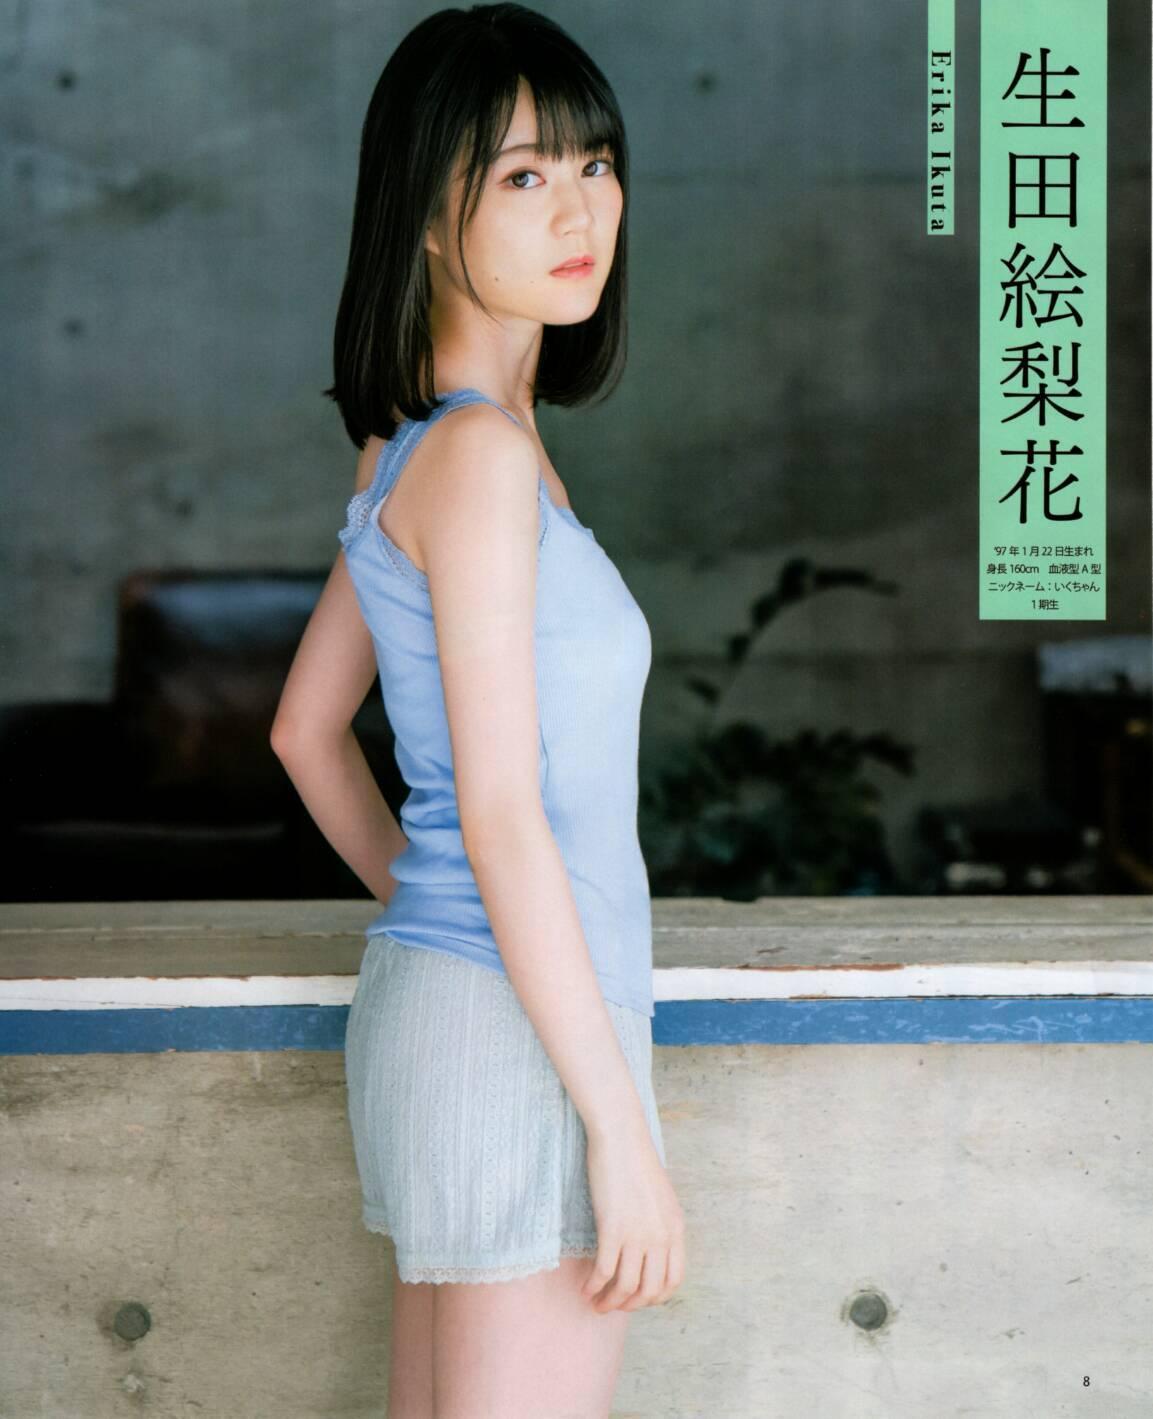 Ikuta Erika 生田絵梨花, Yoda Yuki 与田祐希, BOMB! 2018 No.01 (ボム 2018年01月号)